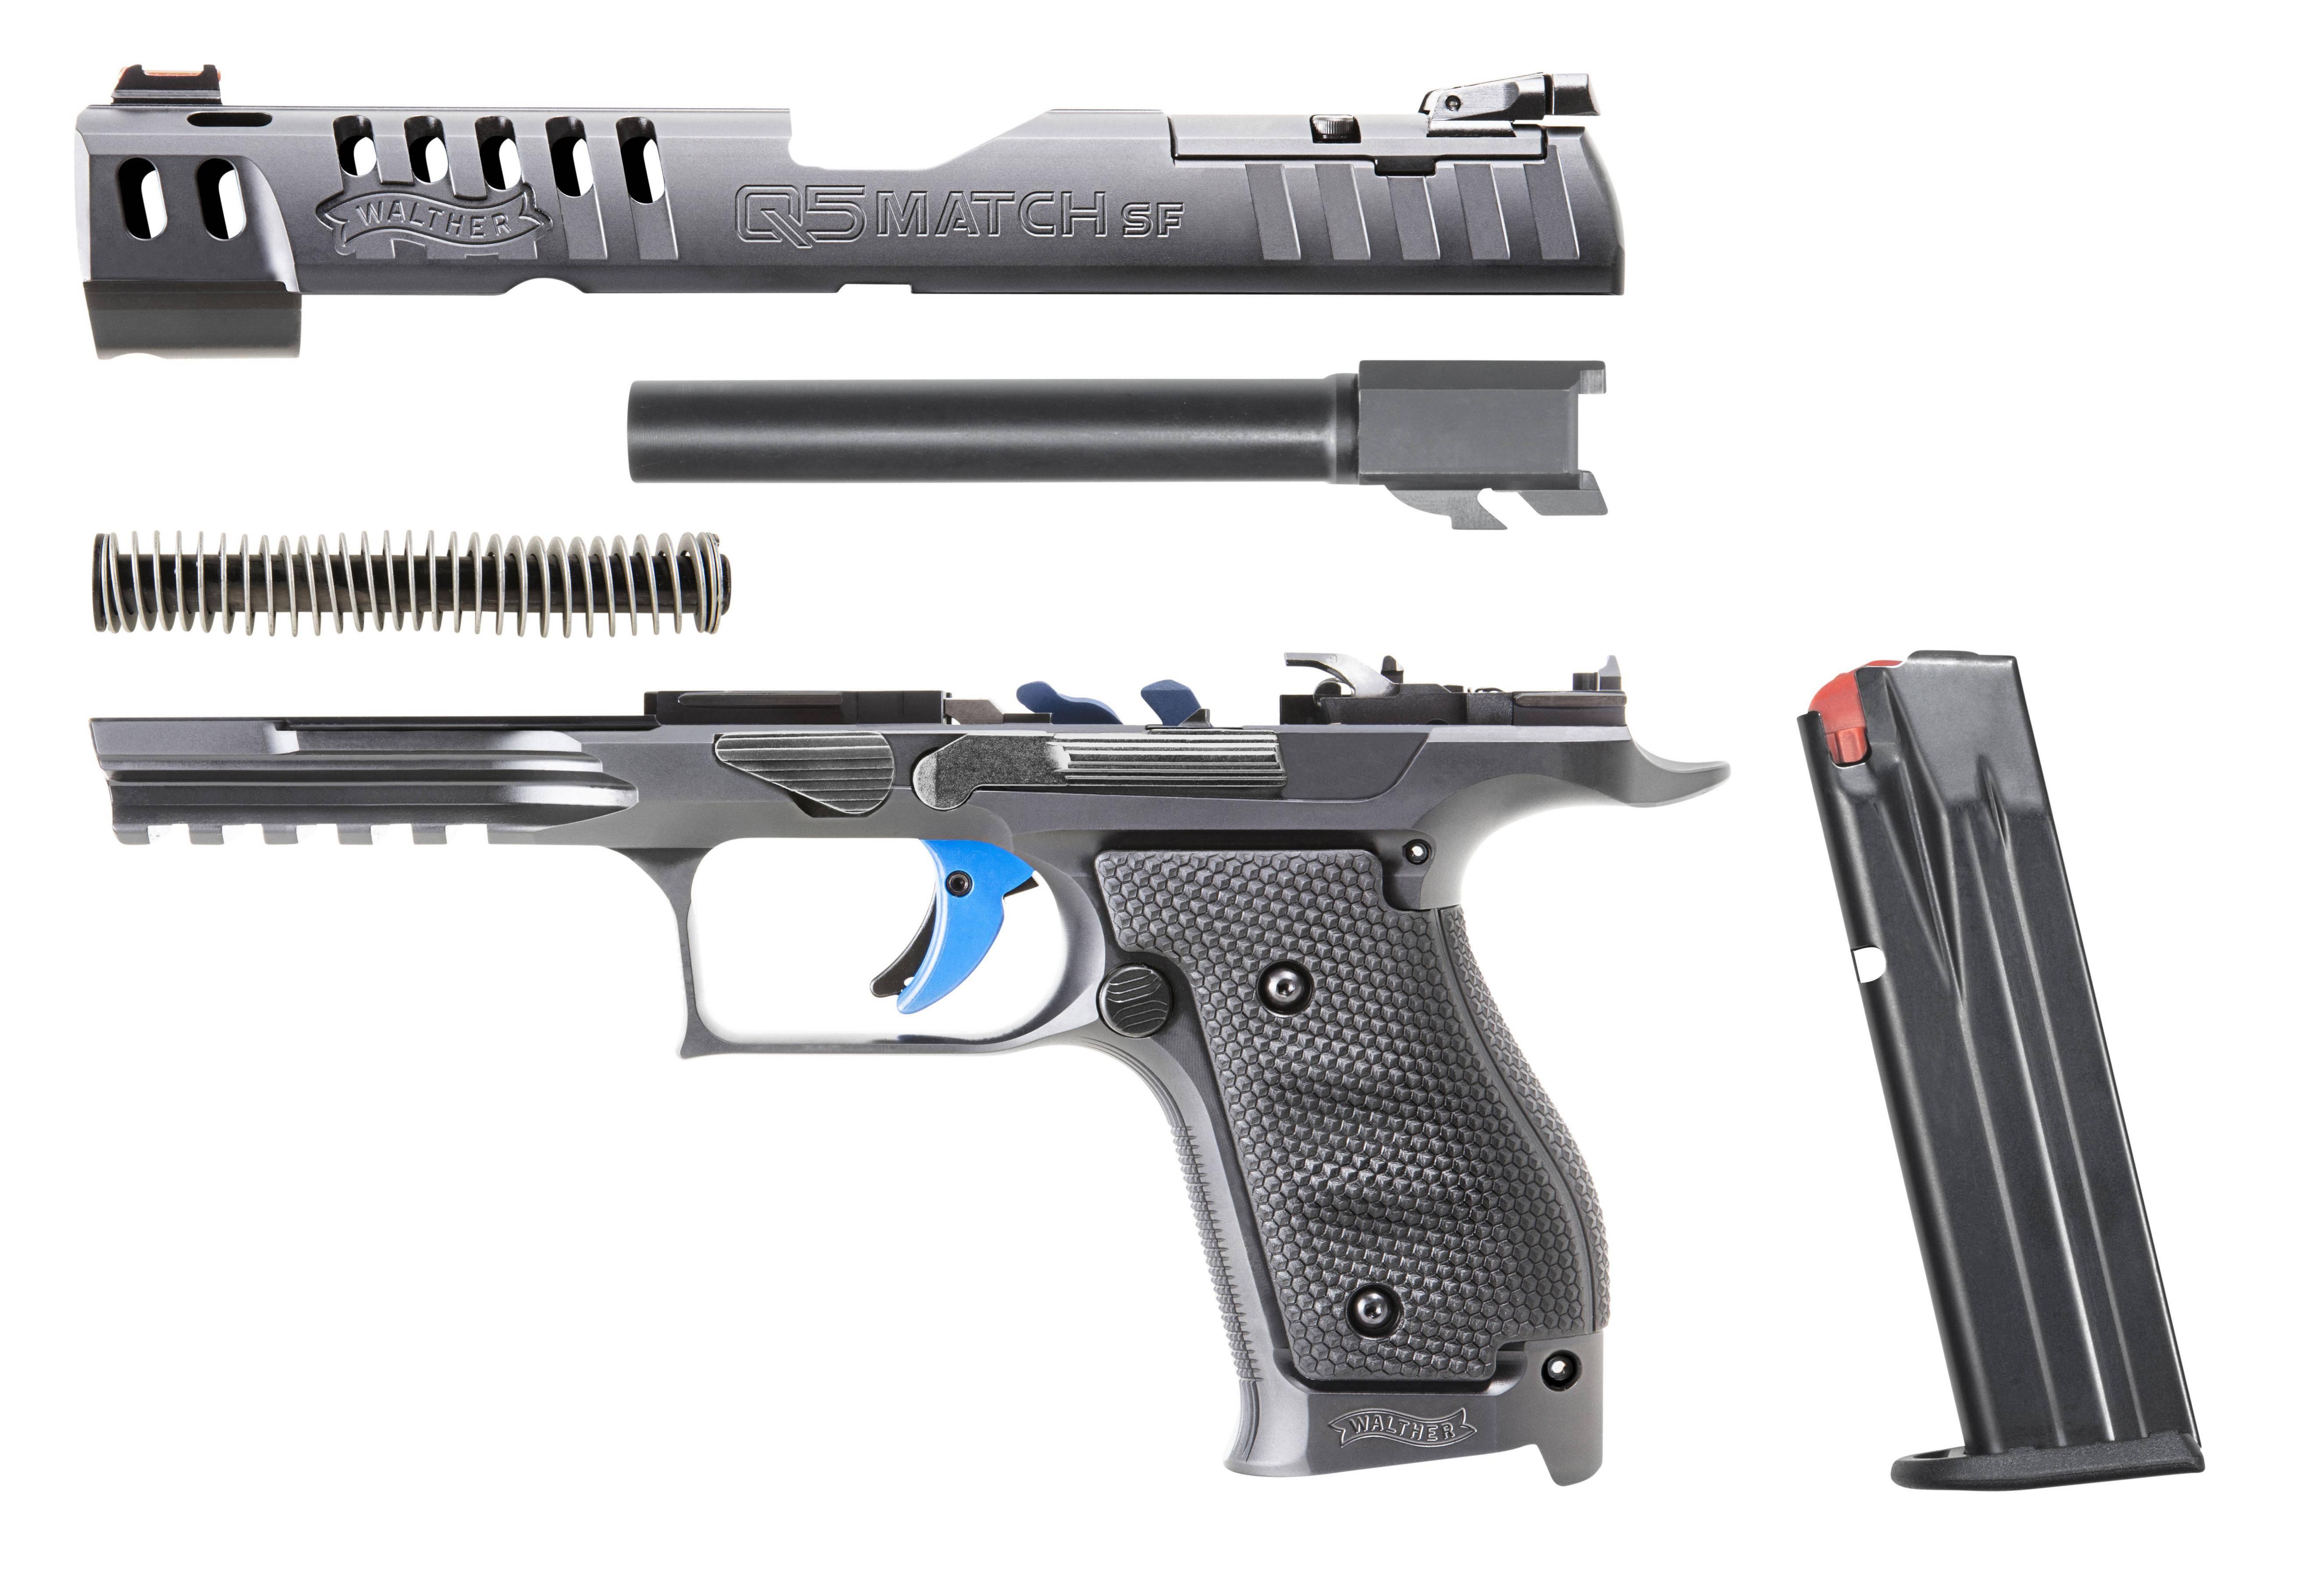 Каталог пневматического оружия. описание и характиристики пневматики - пистолетов и винтовок